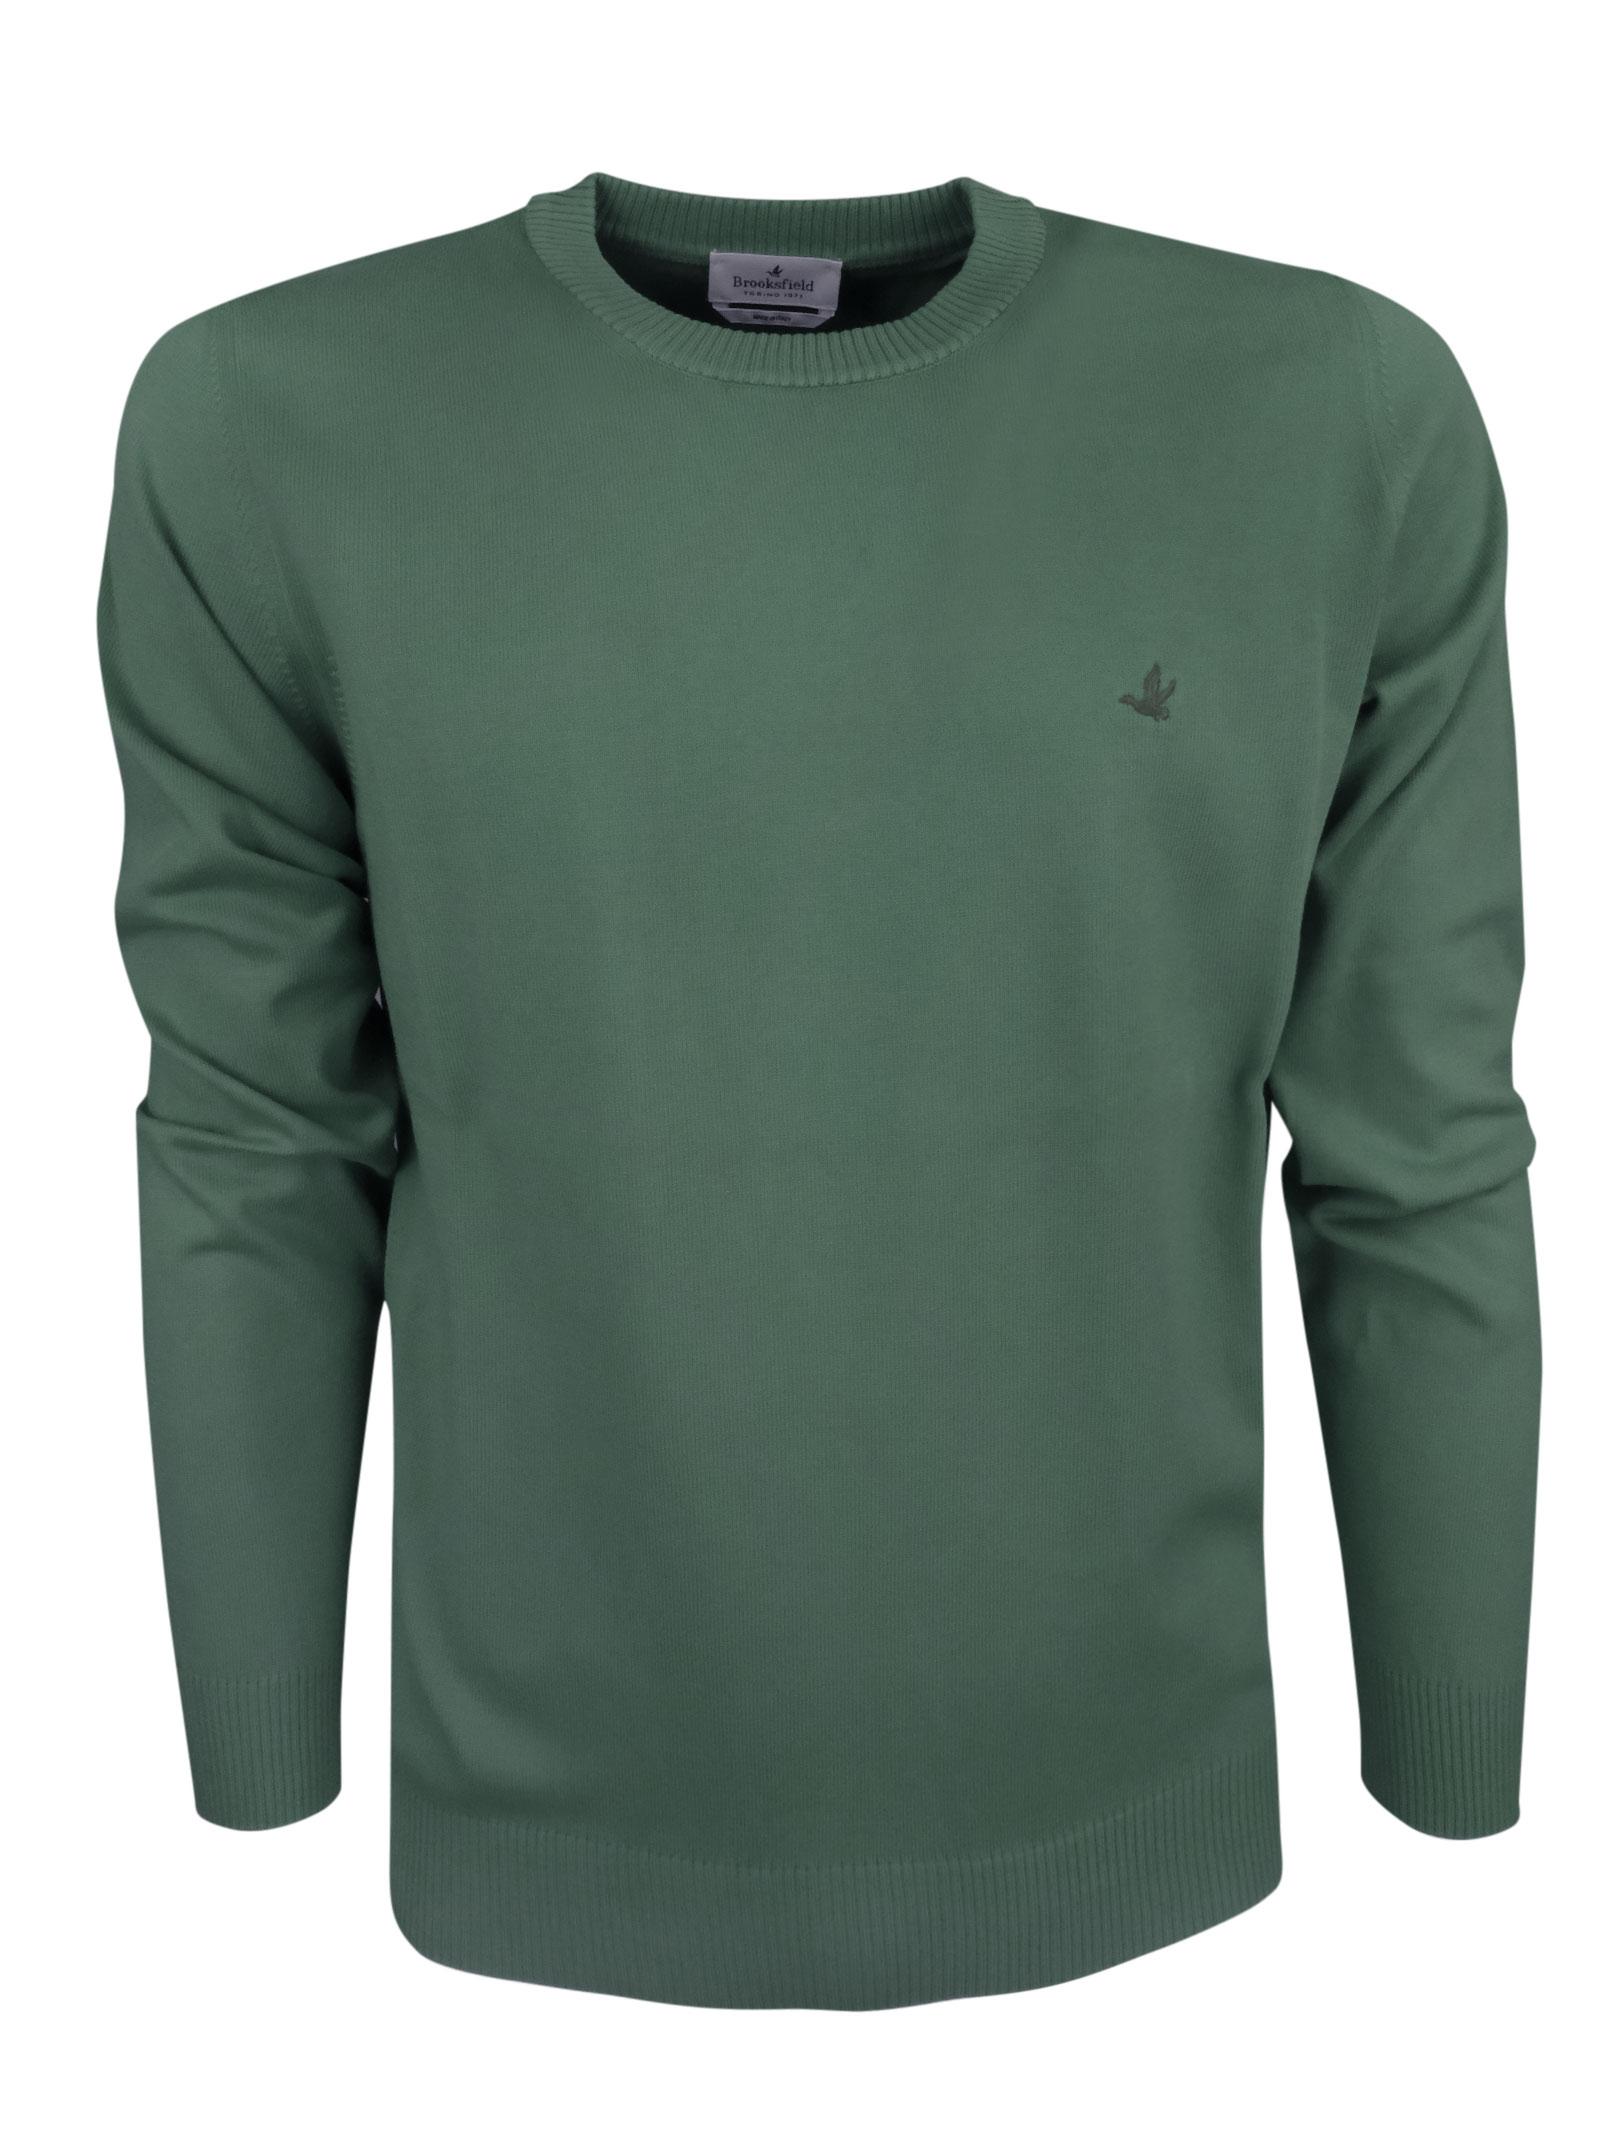 Crew neck cotton  sweater, contrast logo . BROOKSFIELD   Knitwear   203E.A0217240